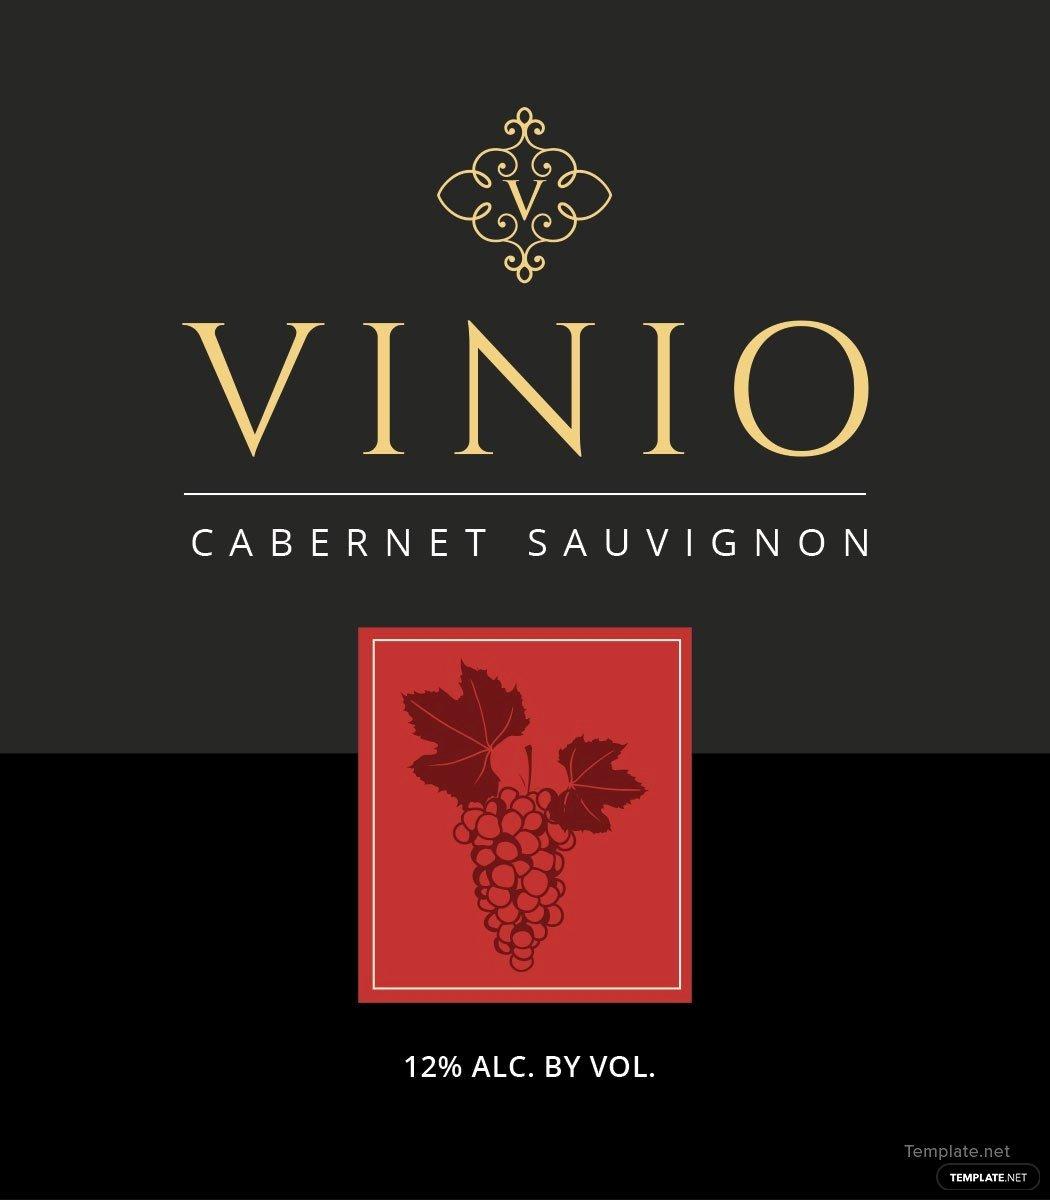 Wine Label Template Word Elegant Free Wine Bottle Label Template In Microsoft Word